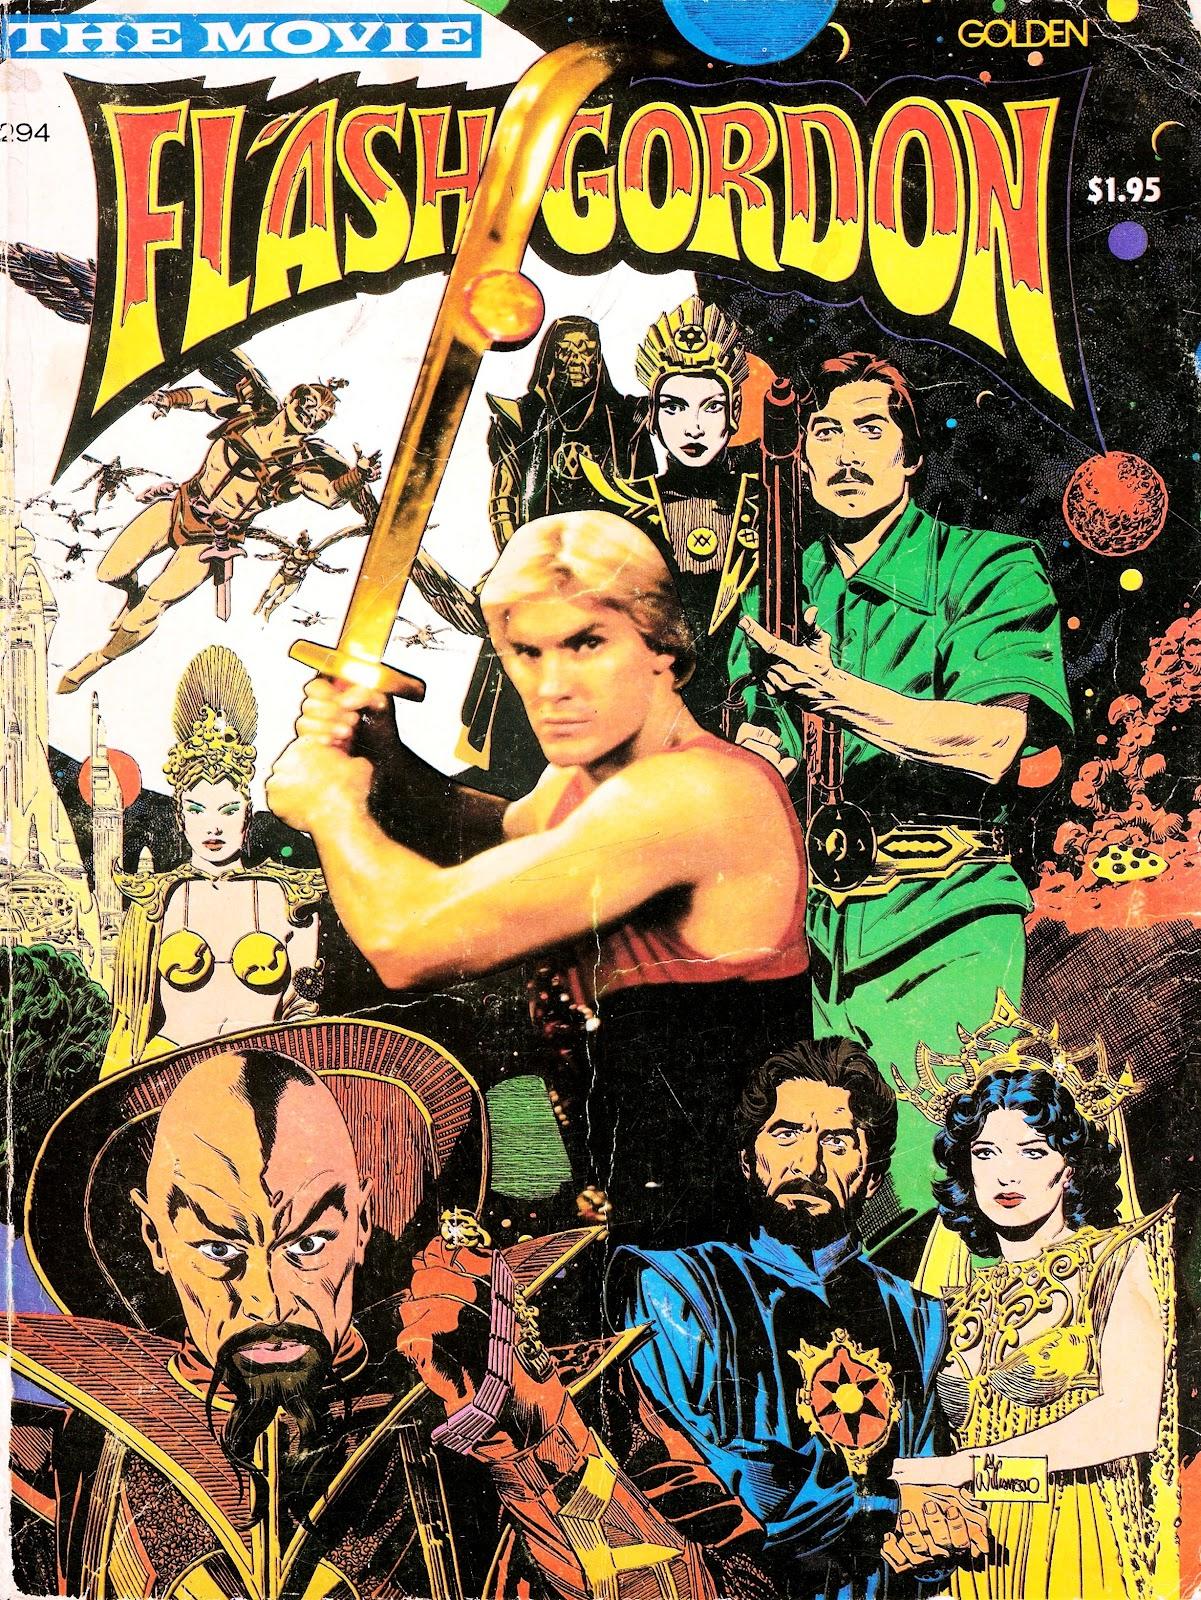 Flash Gordon Movie Special Full Page 1